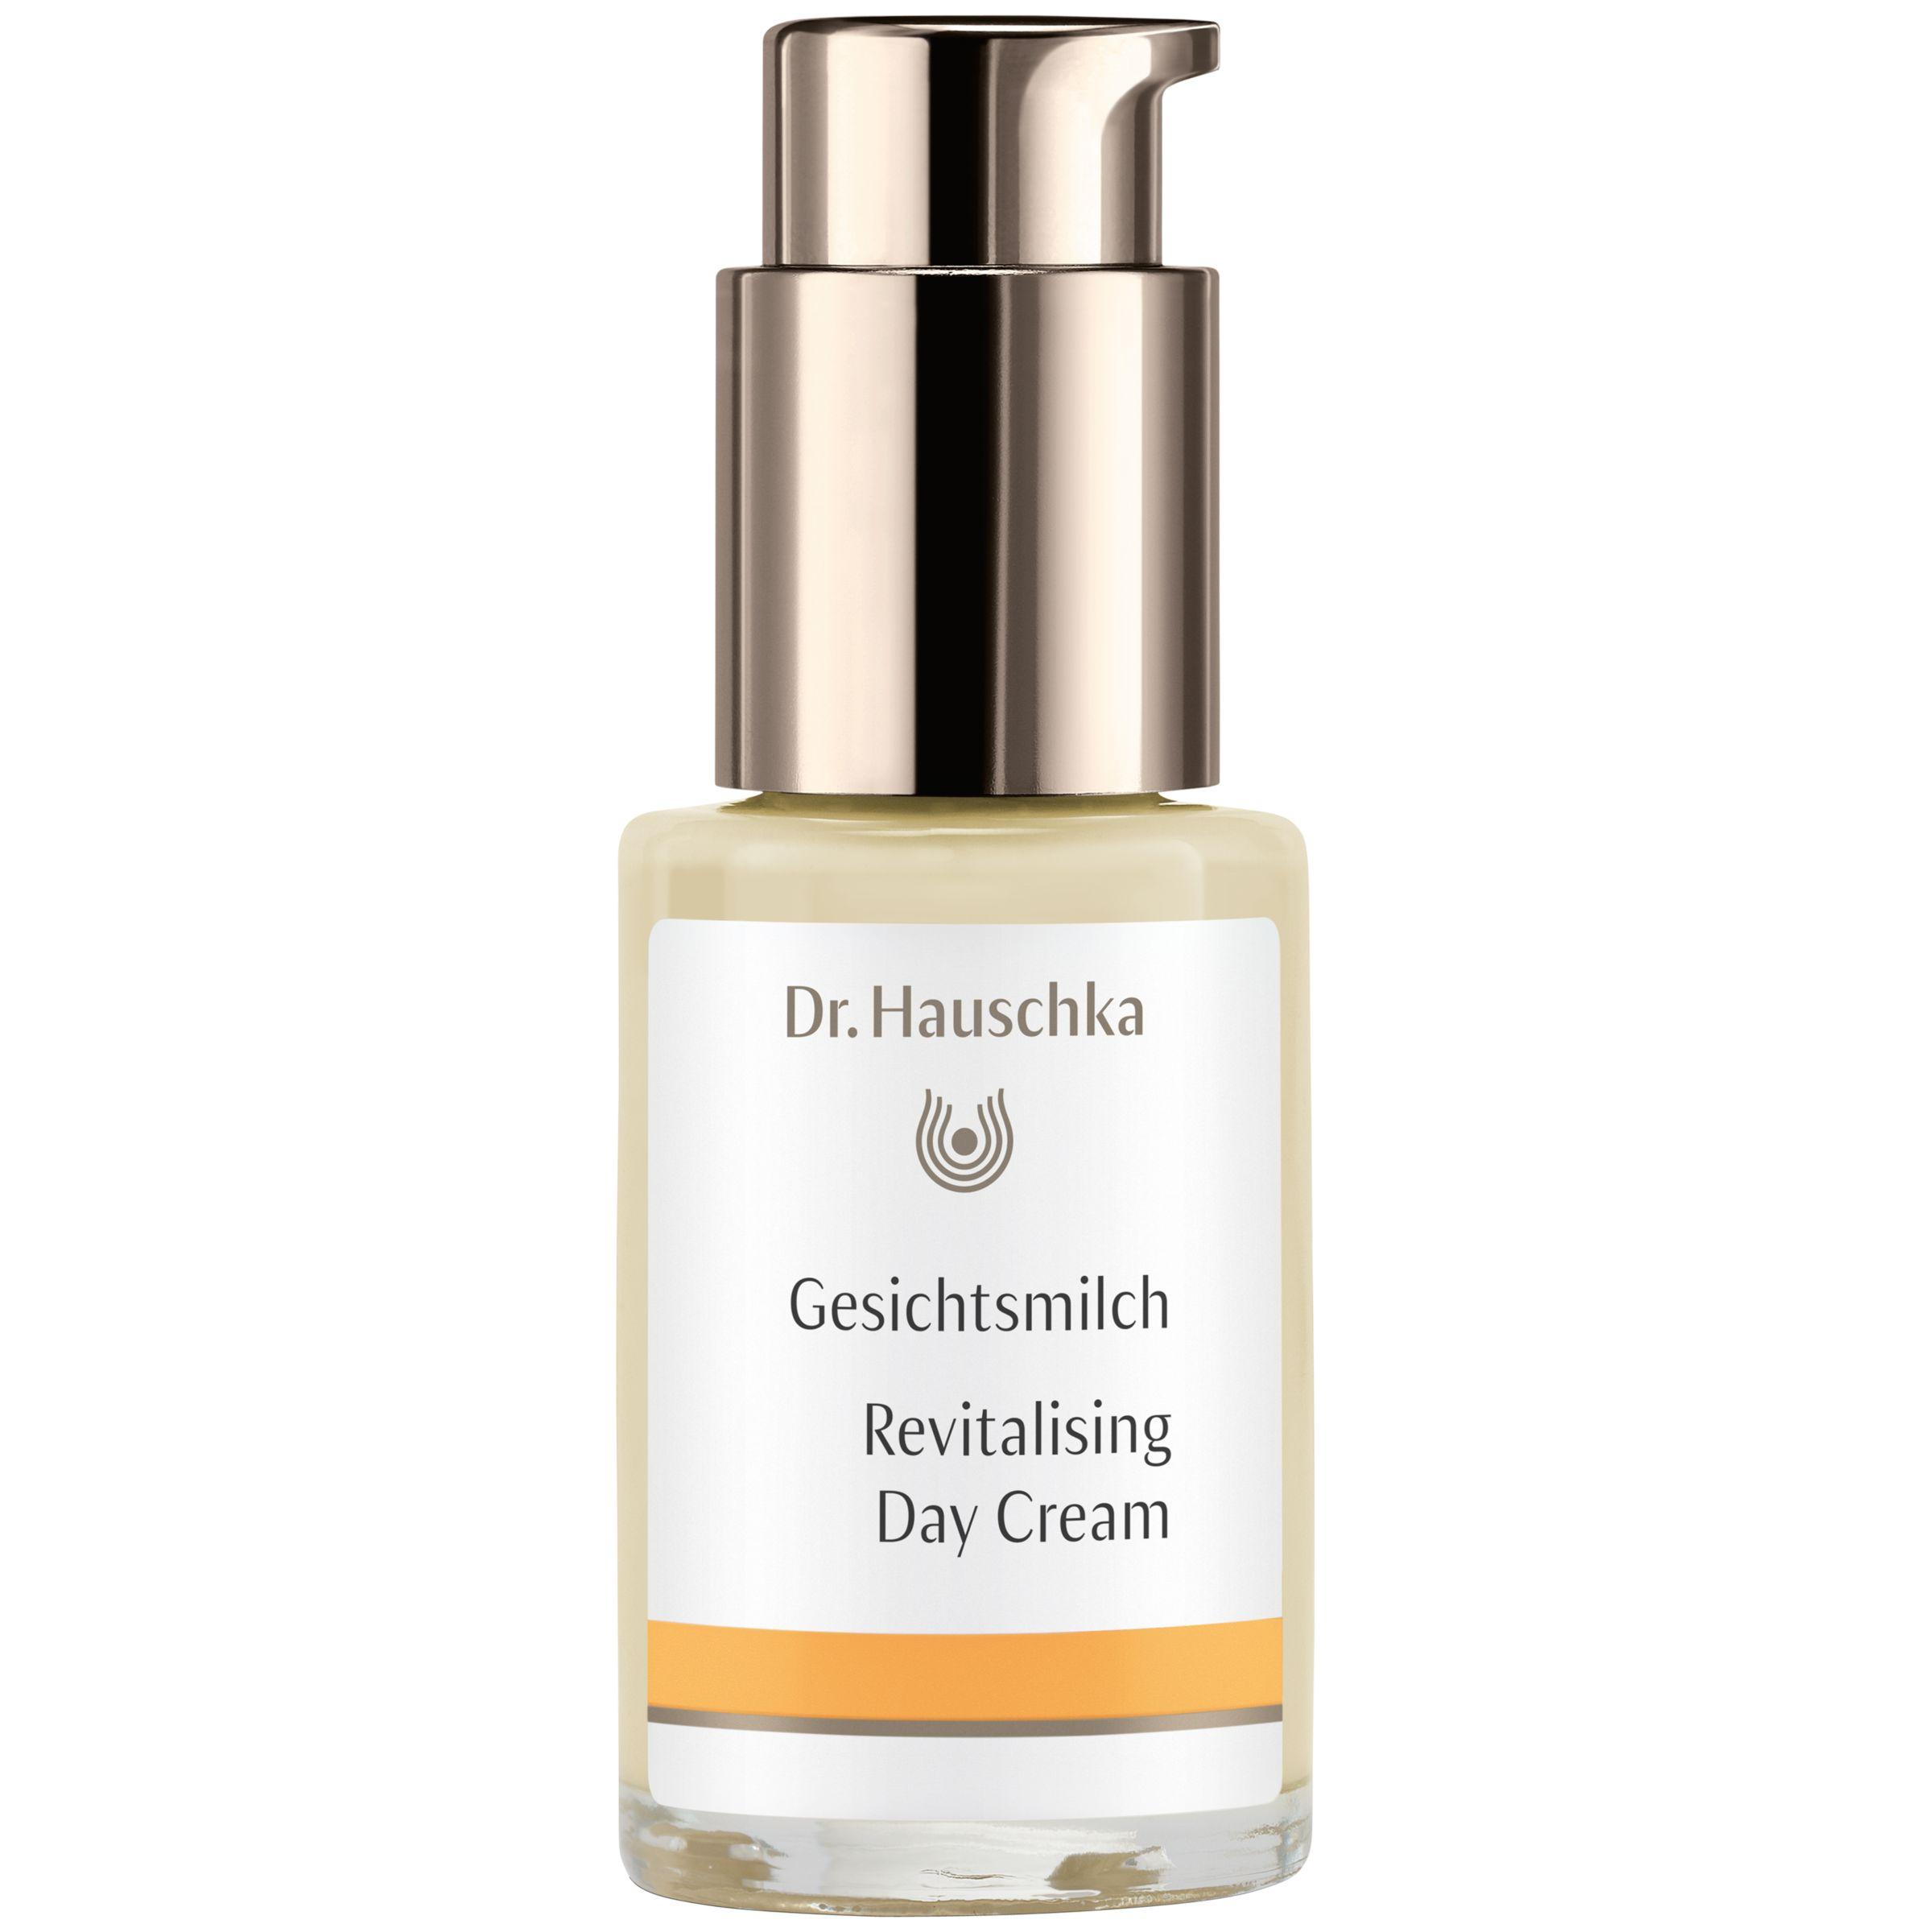 Dr Hauschka Dr Hauschka Revitalising Day Cream